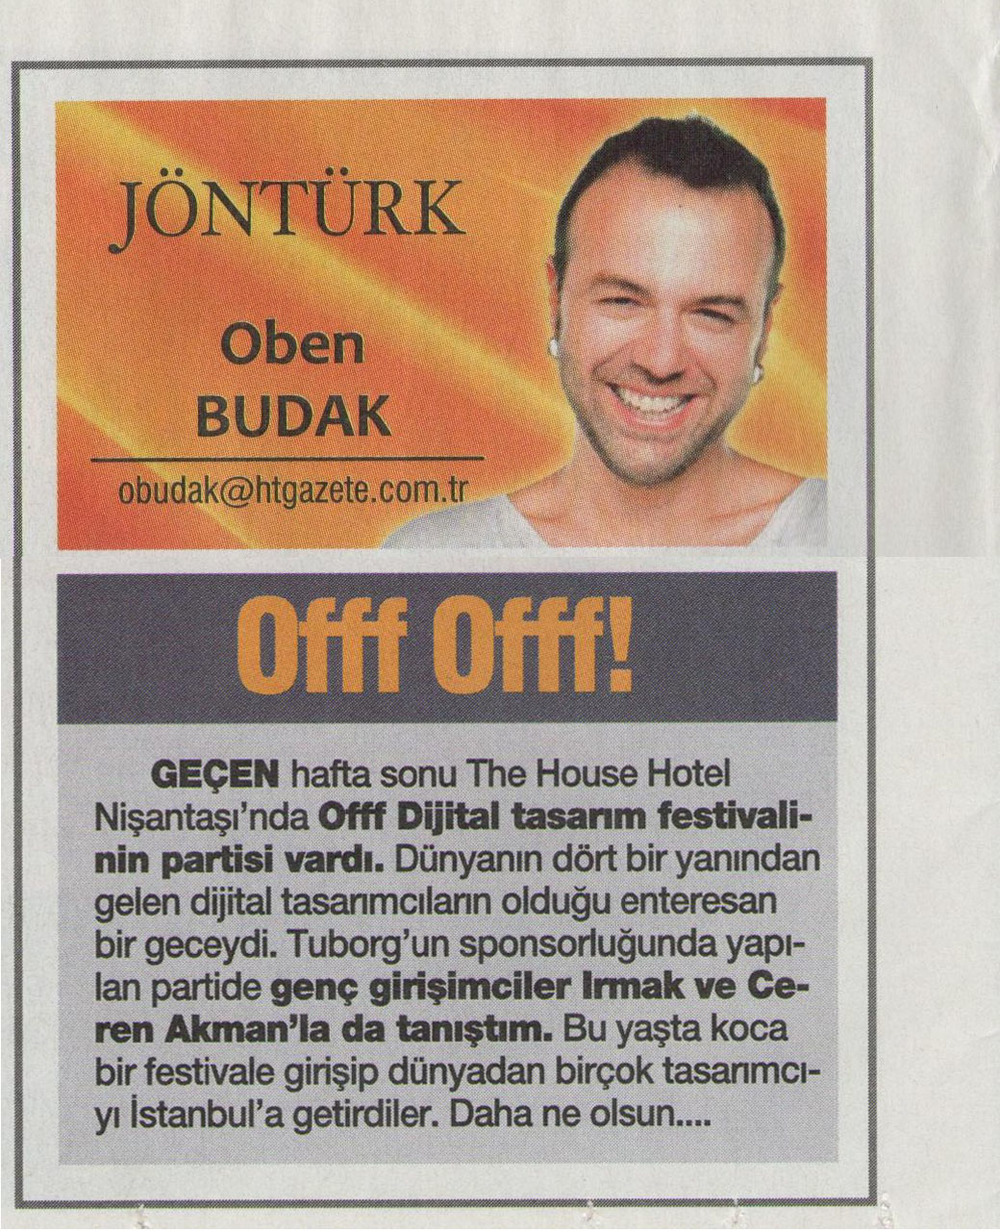 oben budak_haberturk 10.03.2012.jpeg